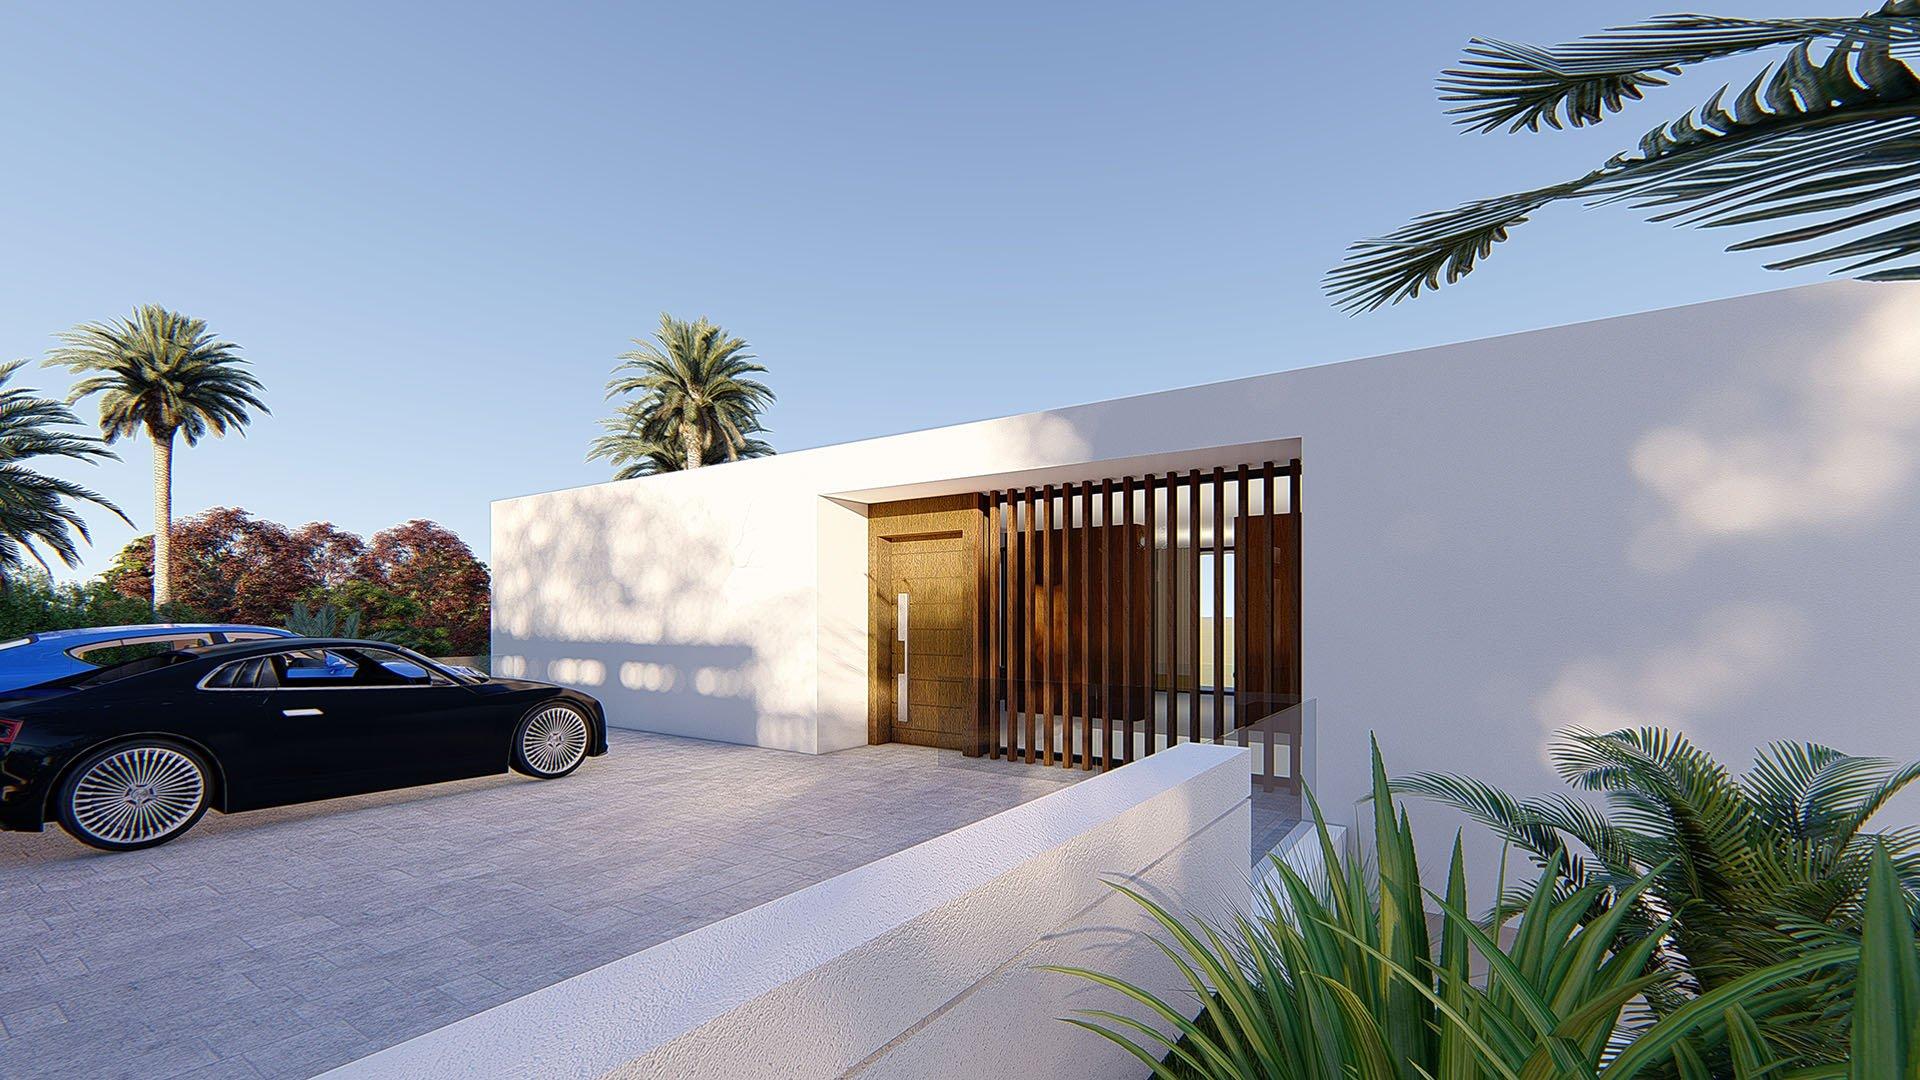 Valle Romano 14: Contemporary villa with golf and sea views